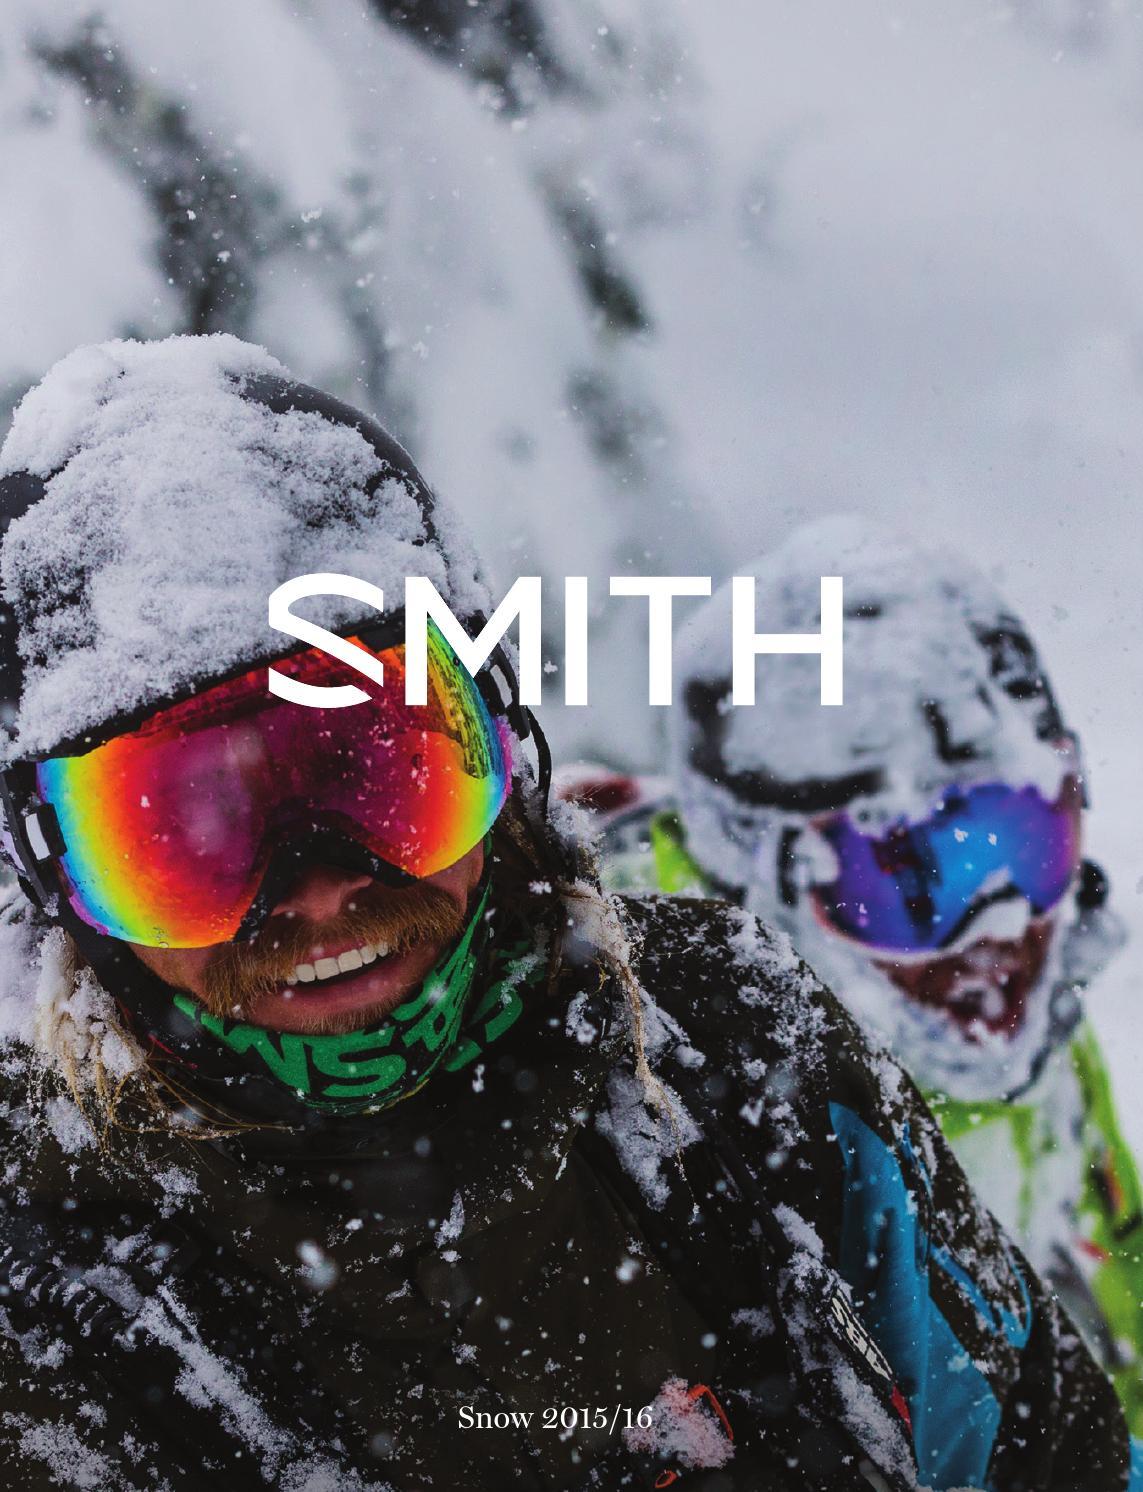 9a29fbb7725d 2016 Smith Snow Catalog by Smith - issuu